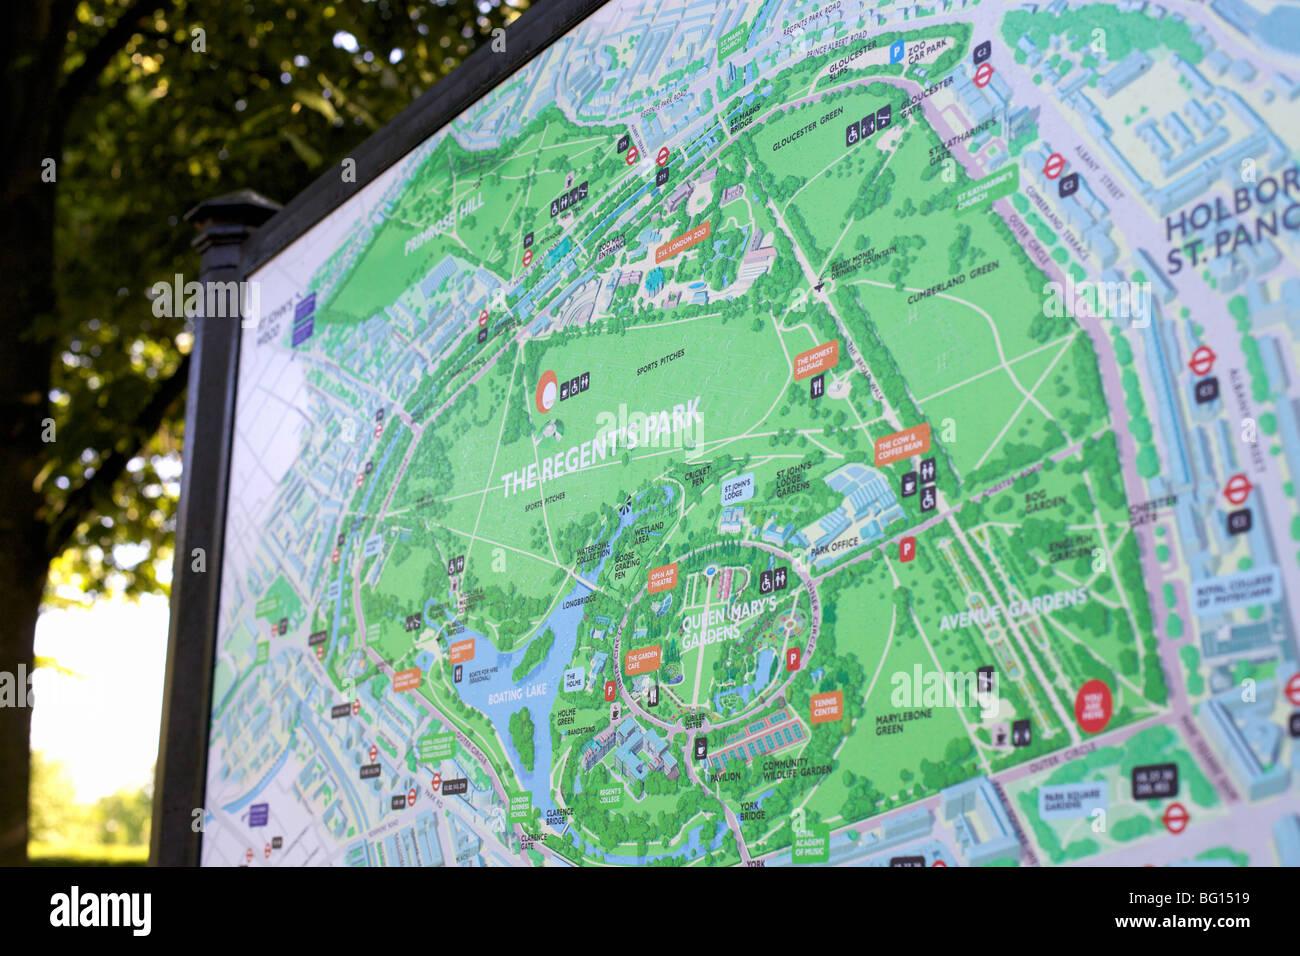 Park Map Regents Park London England United Kingdom Europe - London map in europe